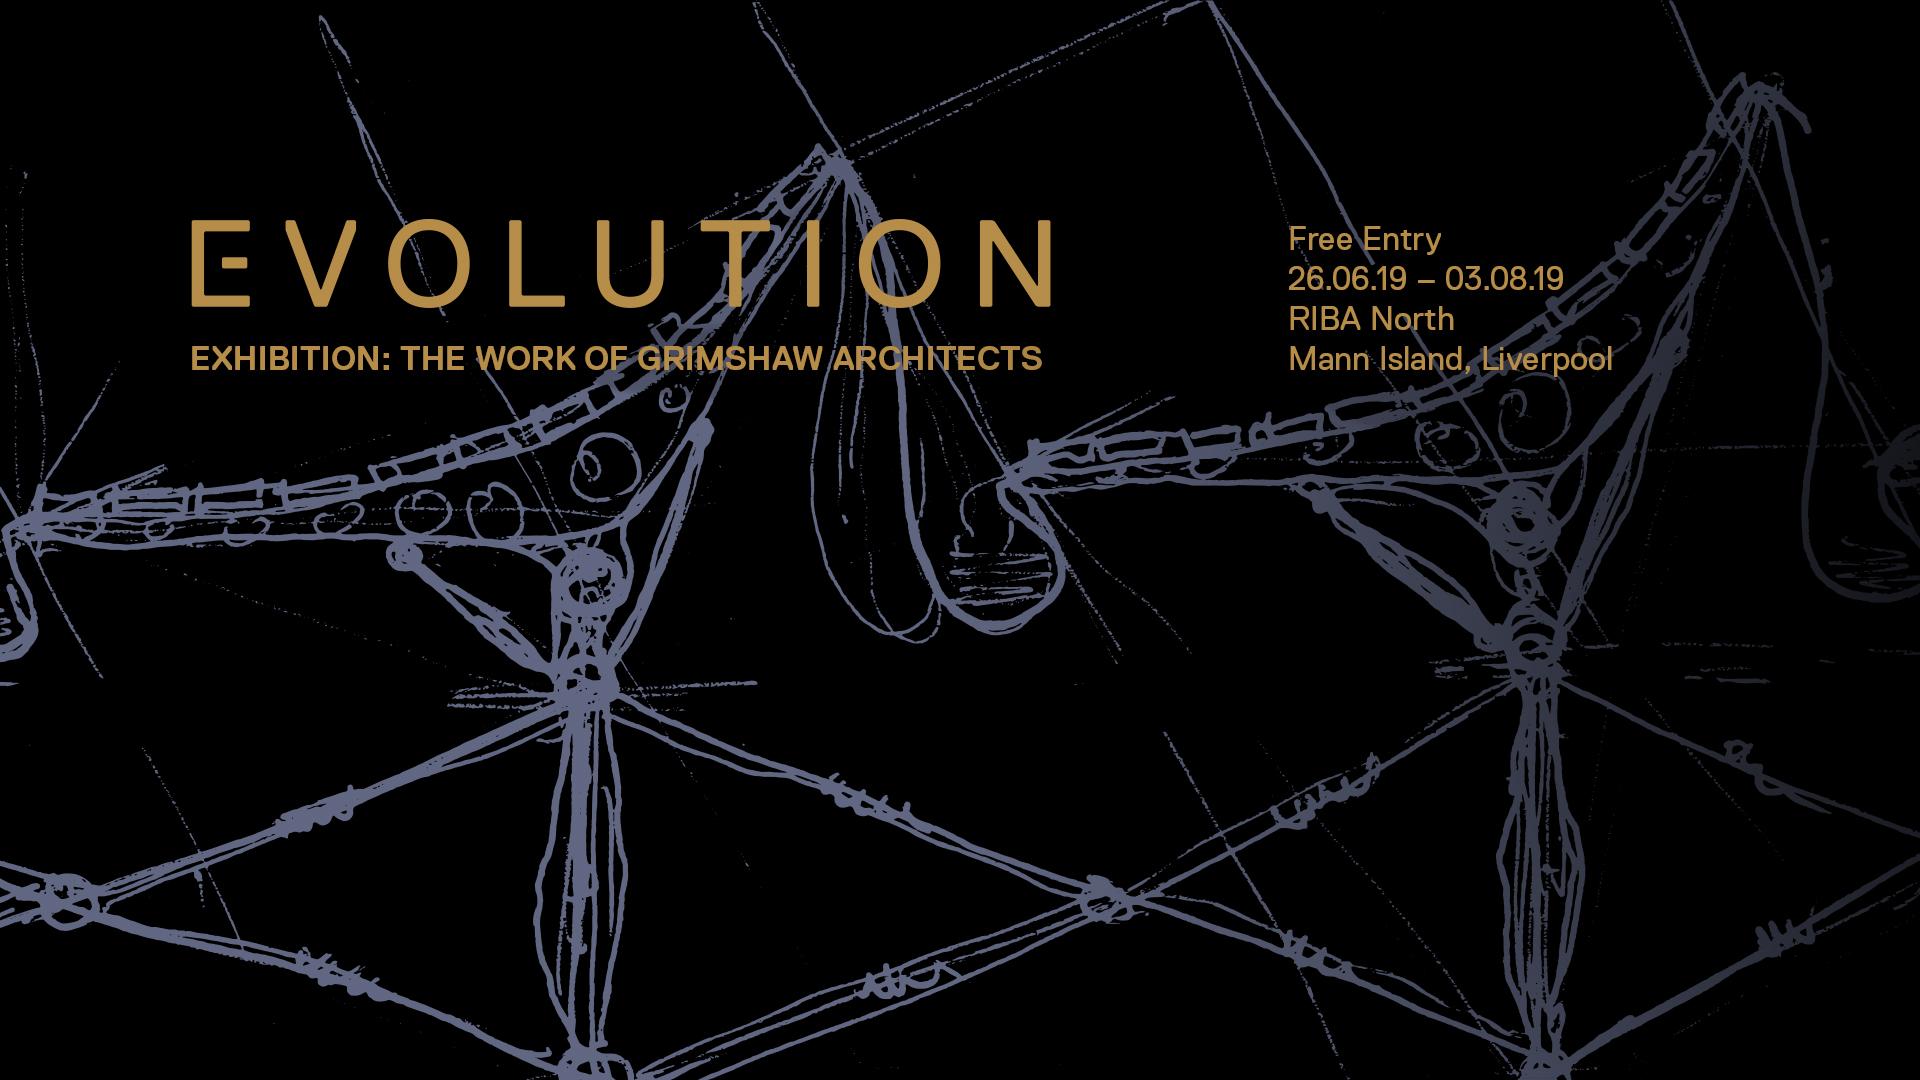 RIBA North: Royal Gold Medal 2019 Exhibition: Evolution by Sir Nicholas Grimshaw